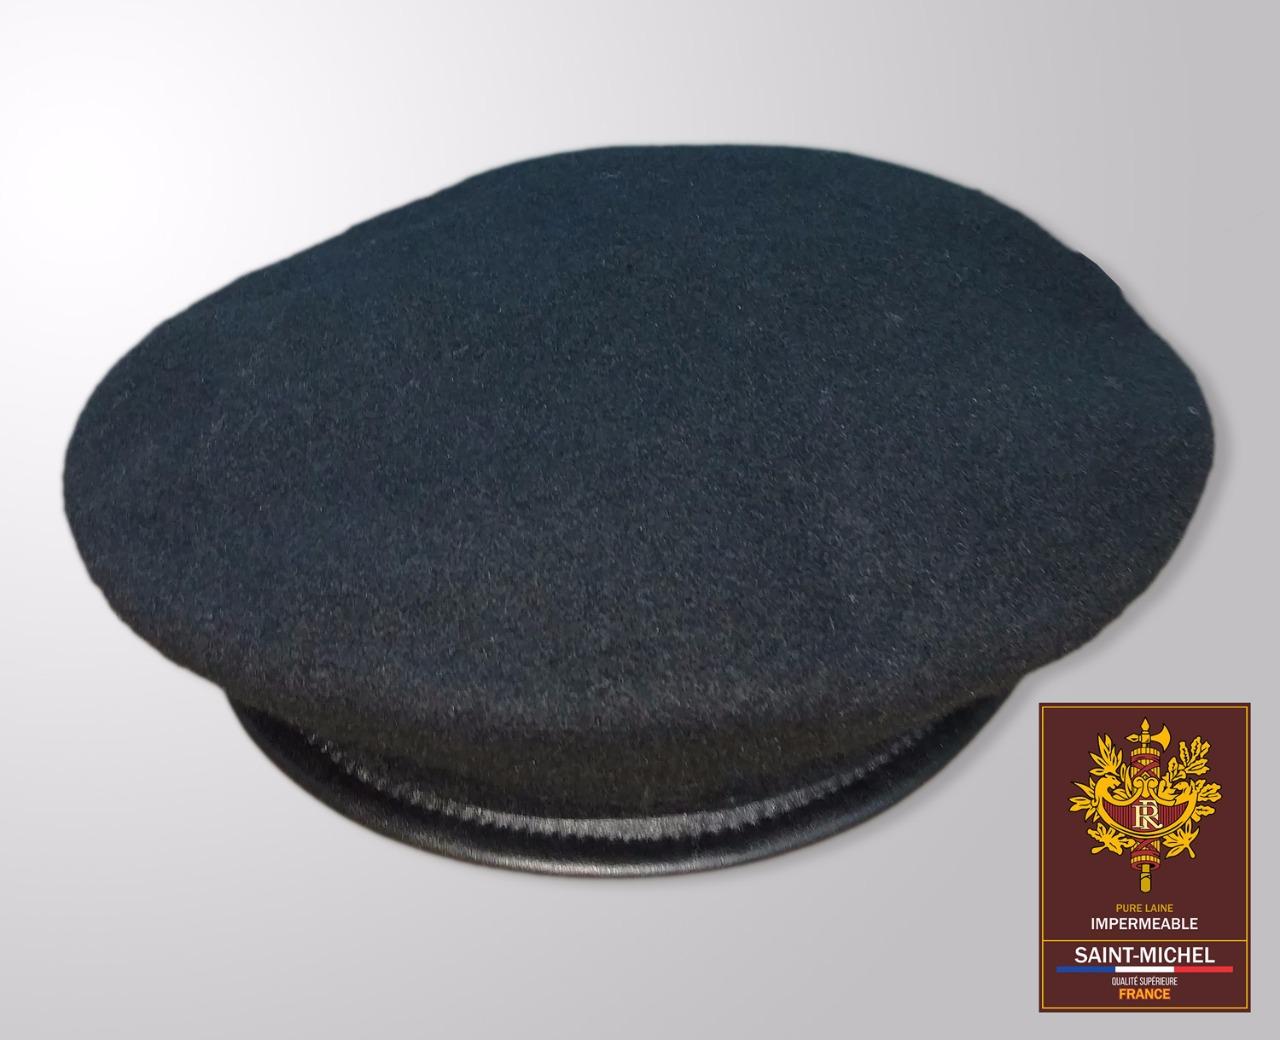 Boina Francesa Saint-Michel 100% Lã - Preta - Militar Brasil - artigos  militares 1d40c088727